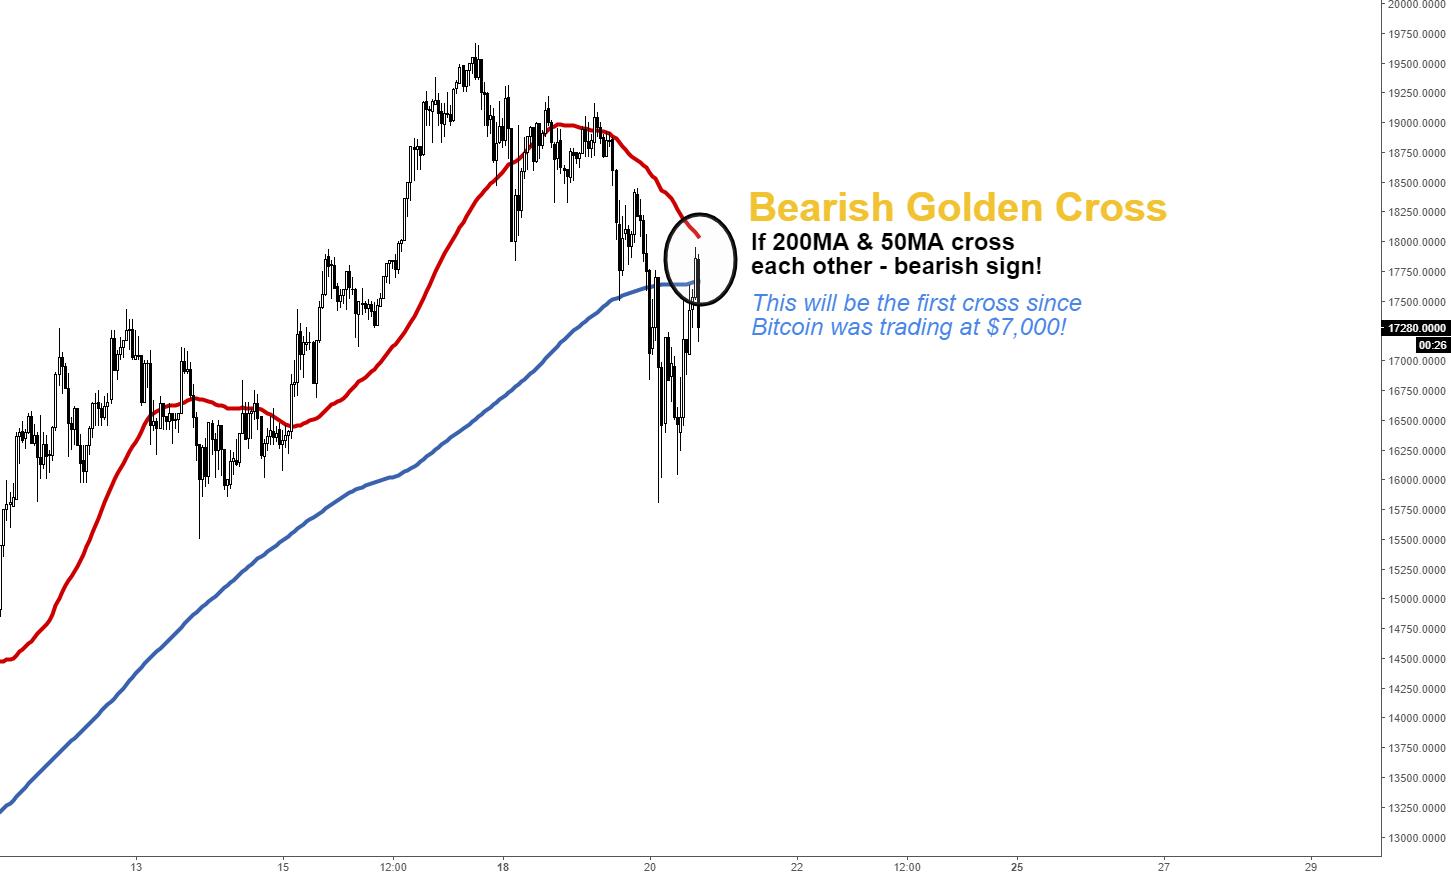 Bitcoin - Golden Bearish Cross